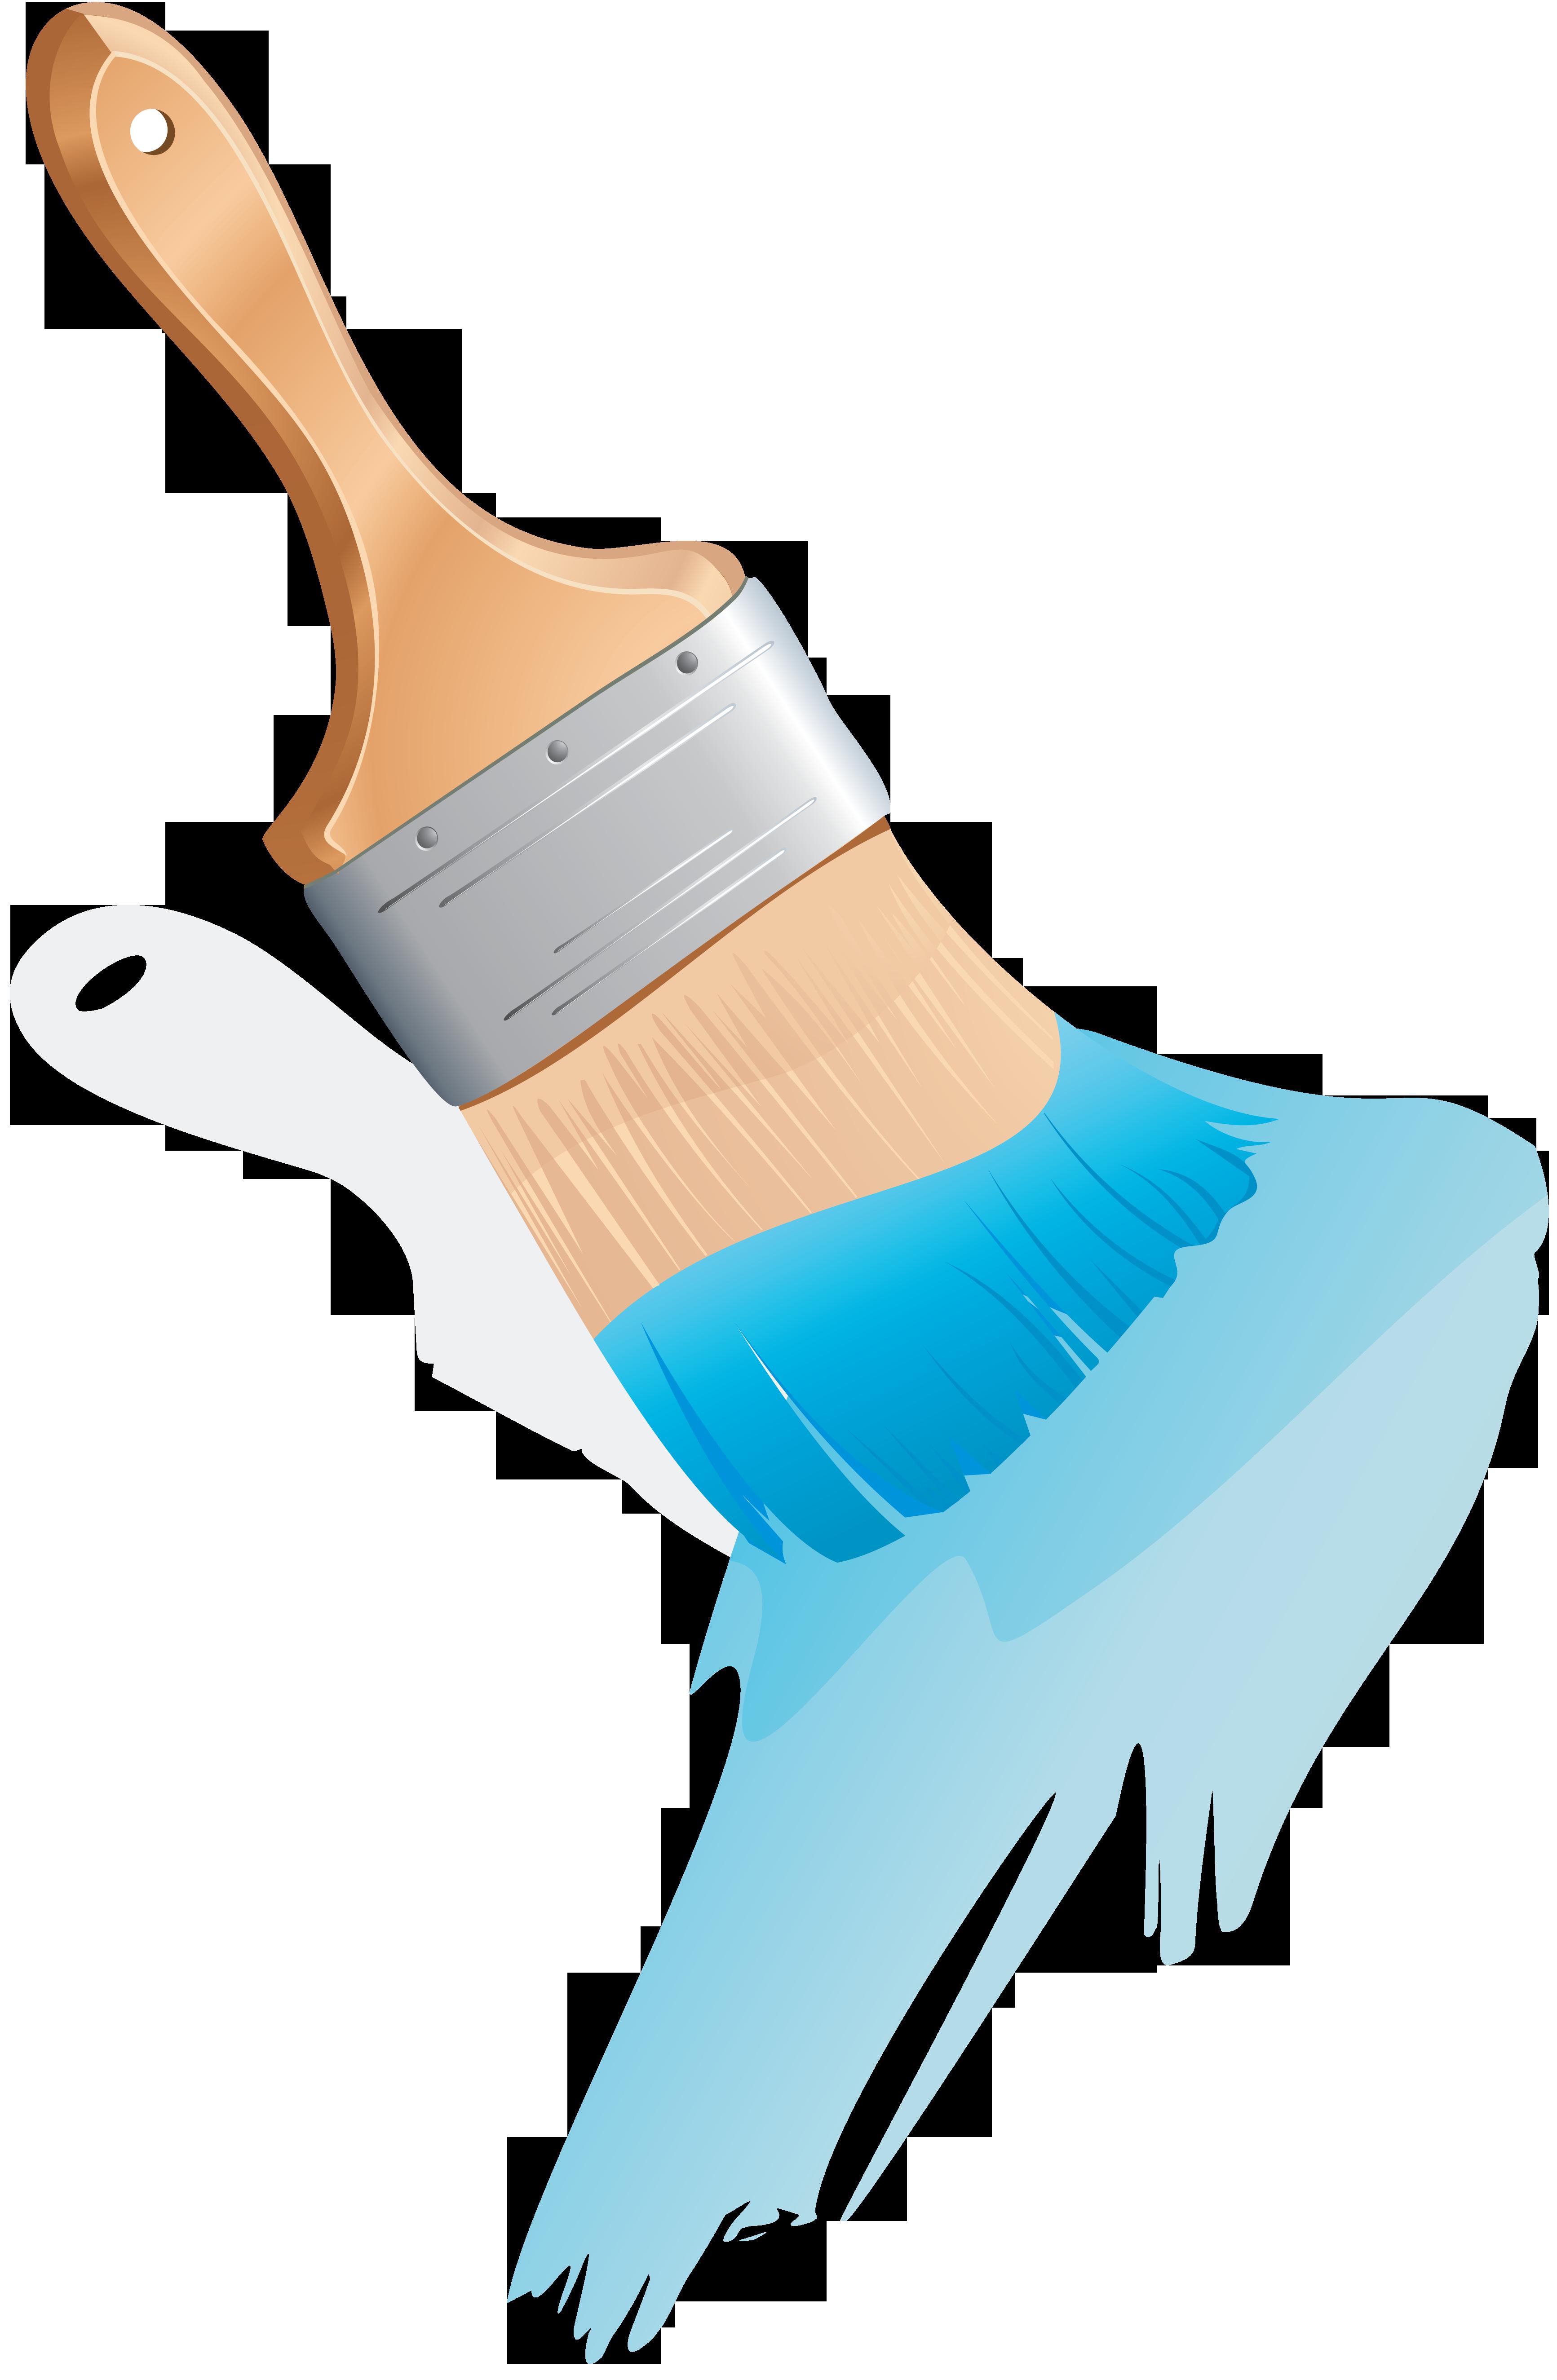 Paint brush png image. Paintbrush clipart bursh